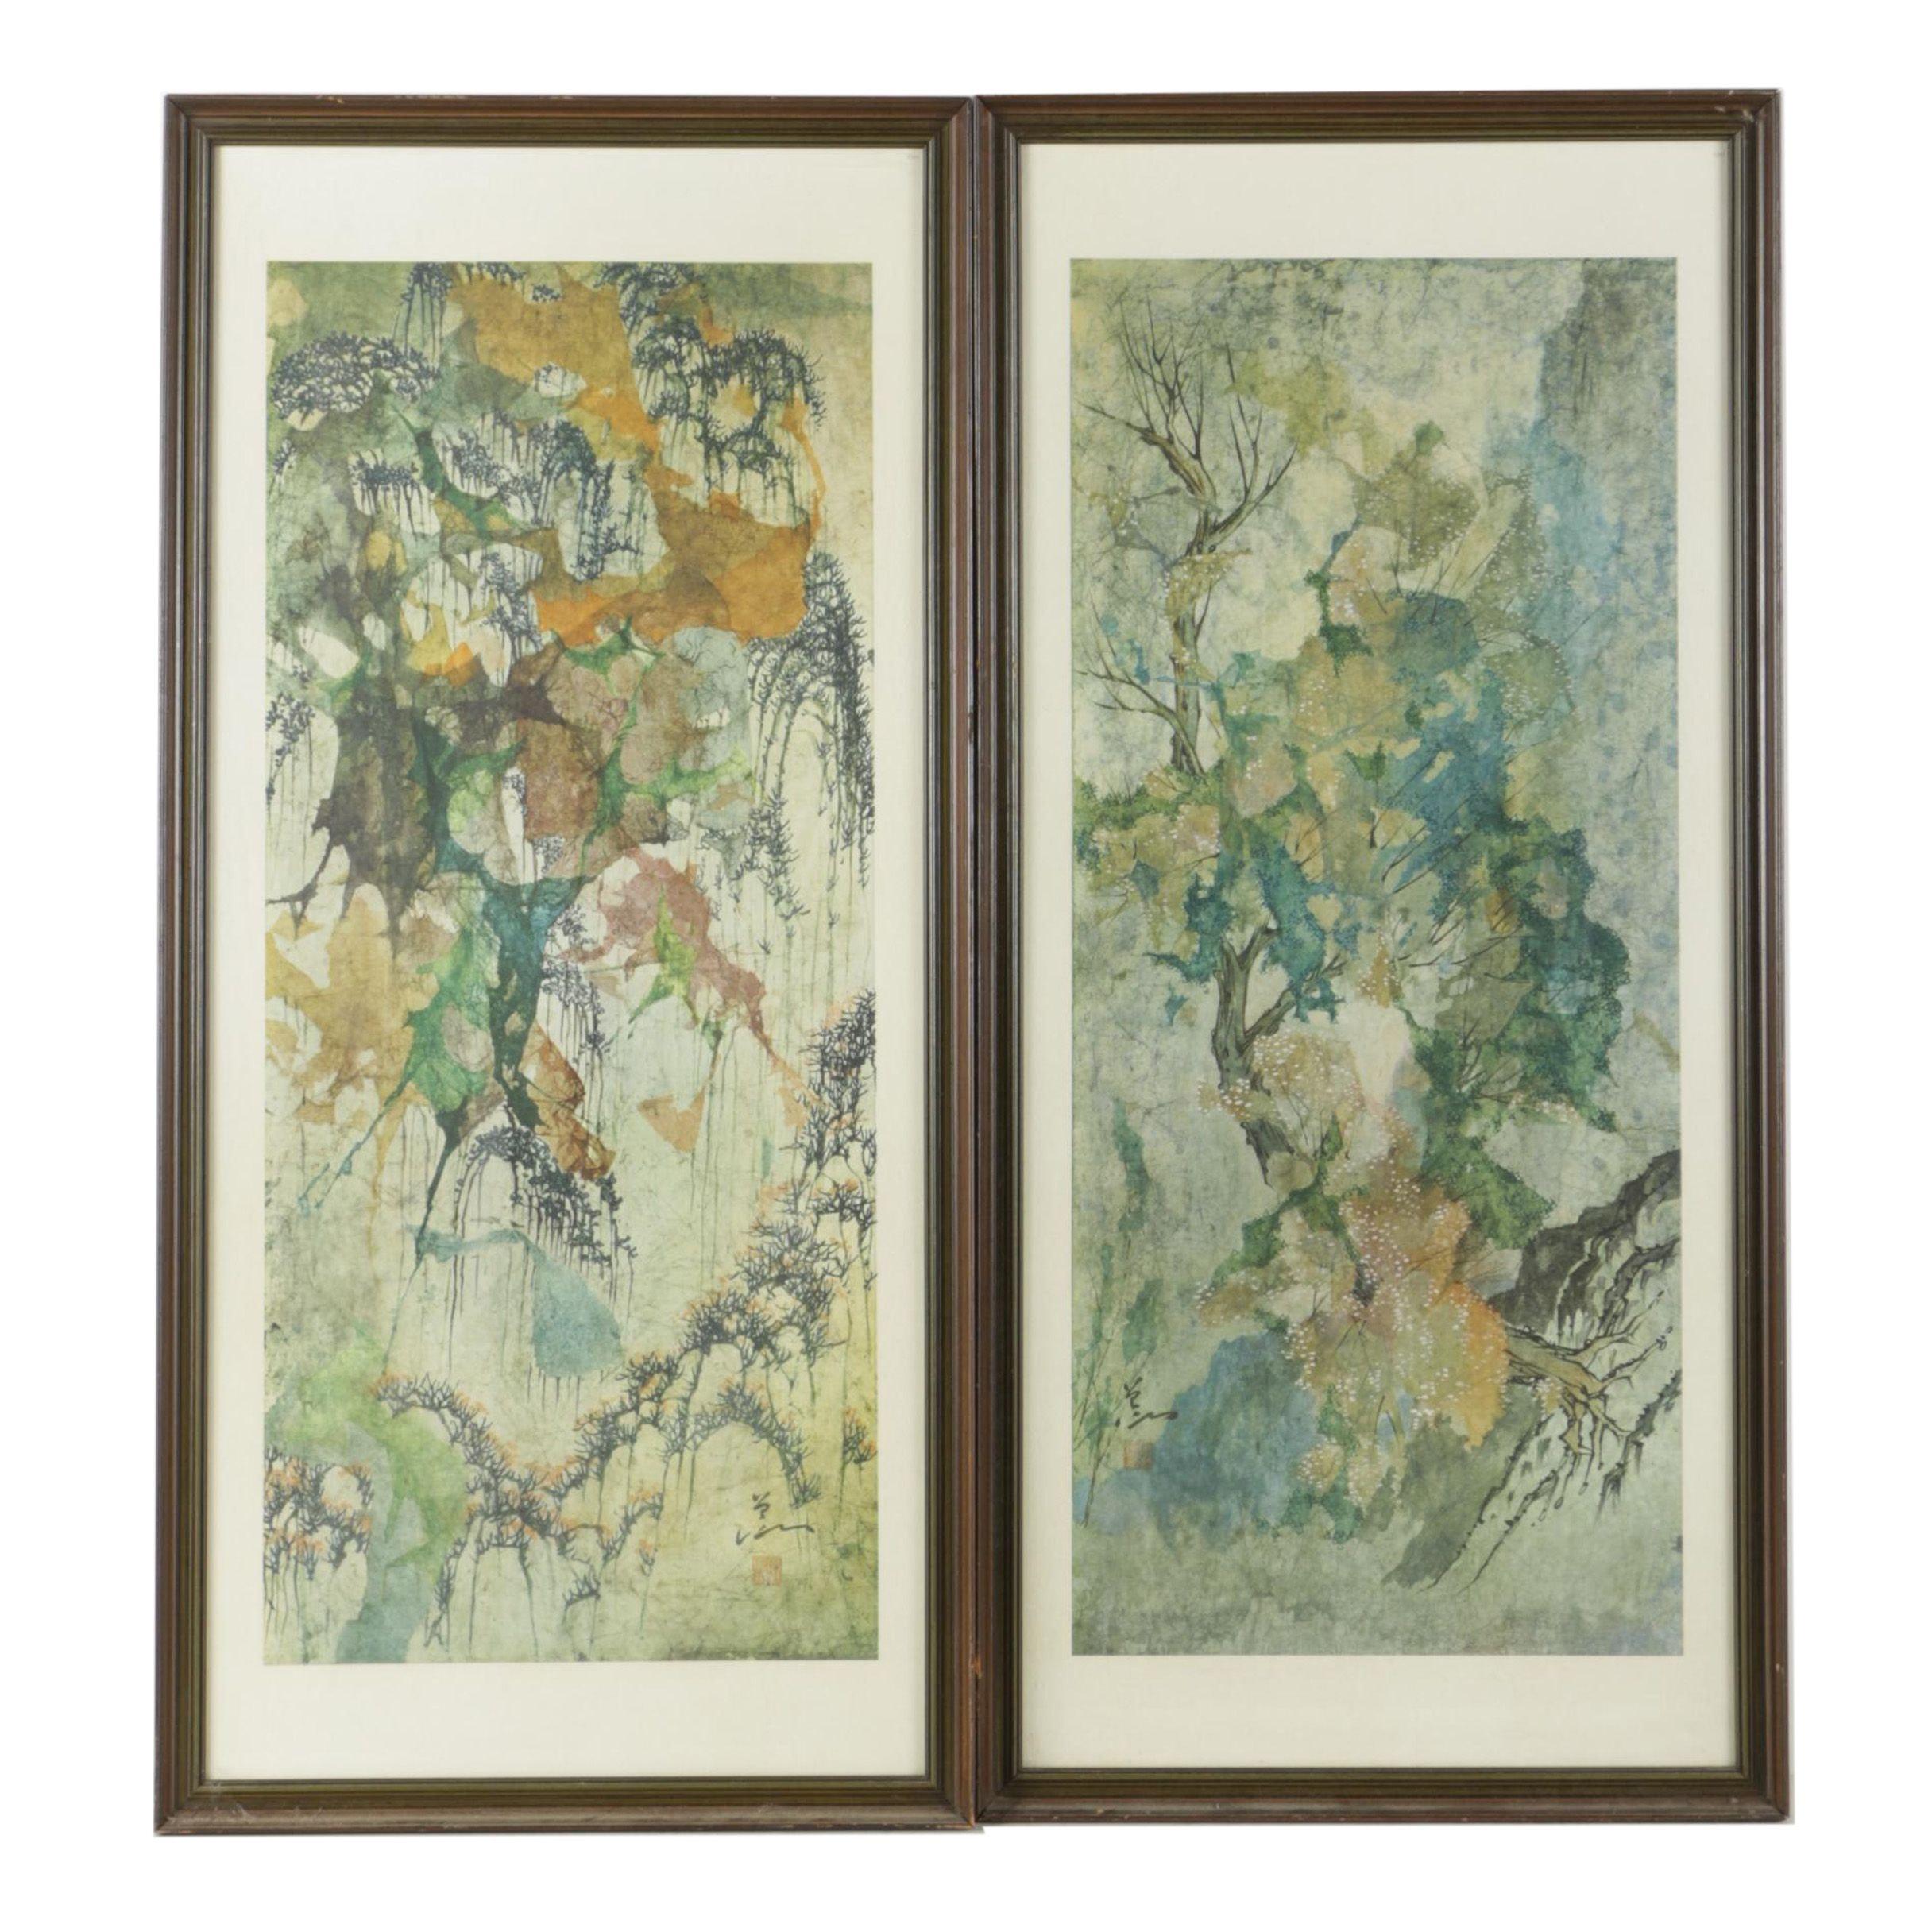 East Asian Style Giclée Prints of Landscapes